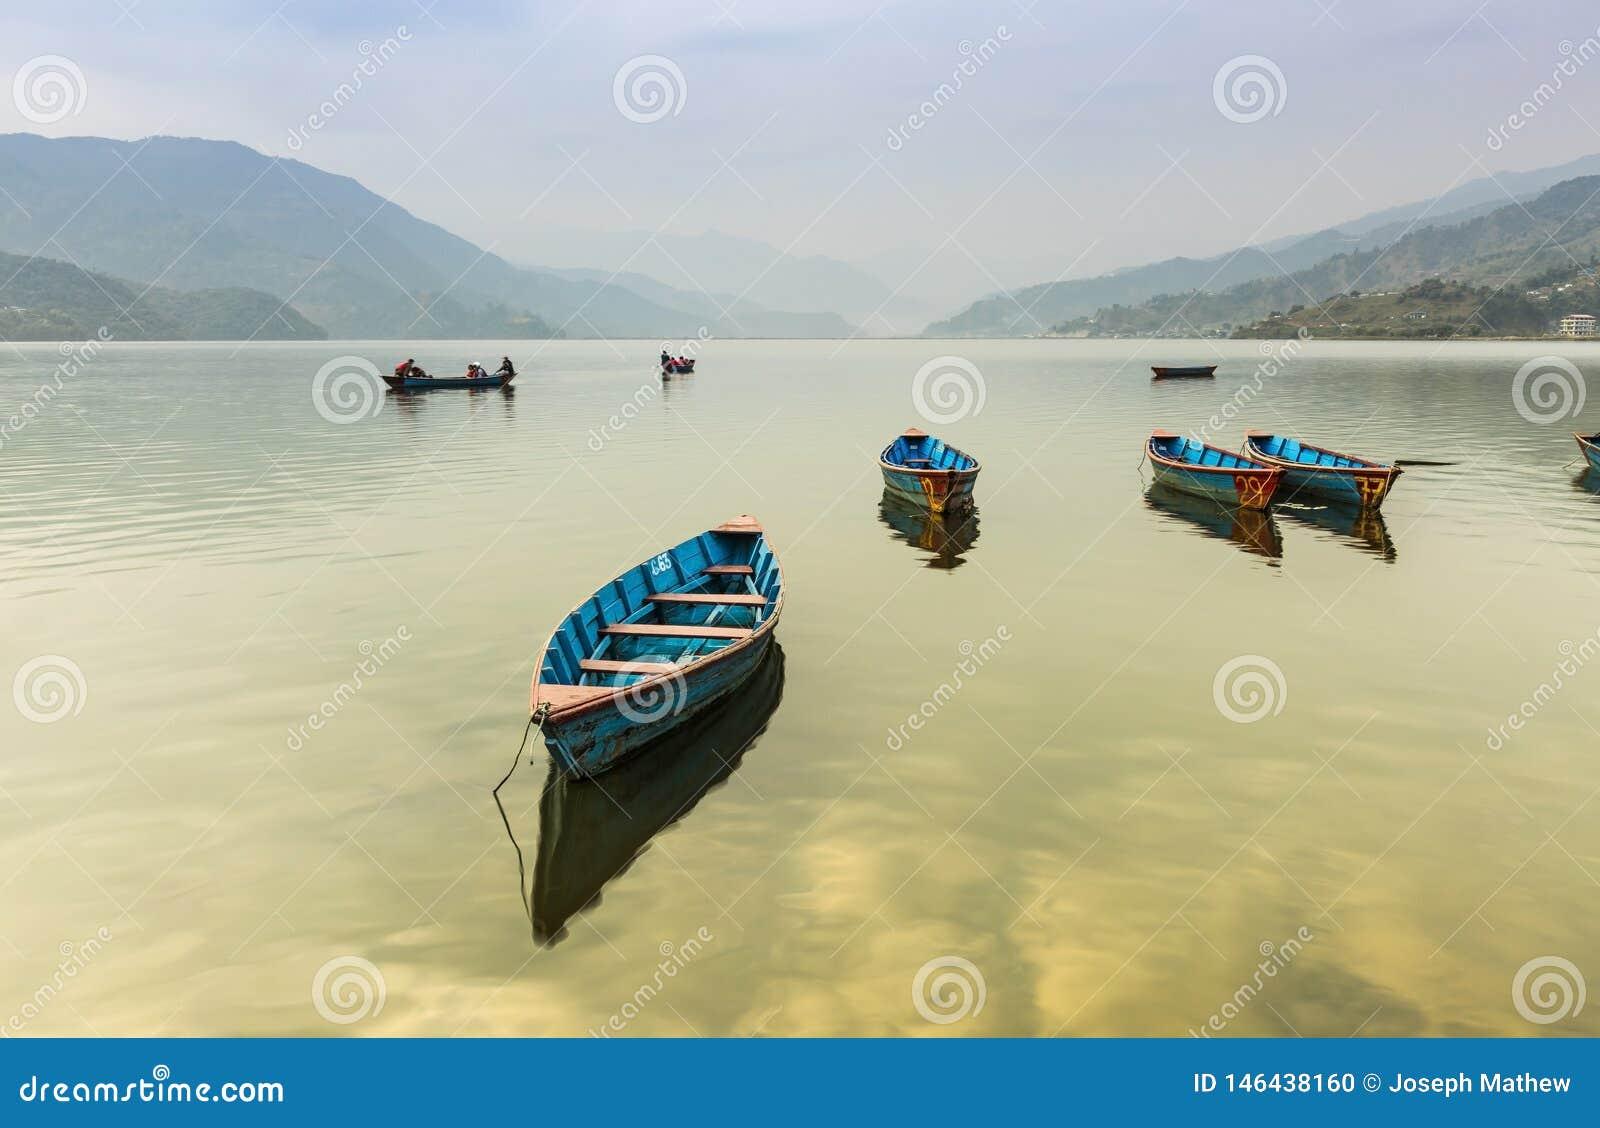 BOATS IN FEVA LAKE POKHARA NEPAL